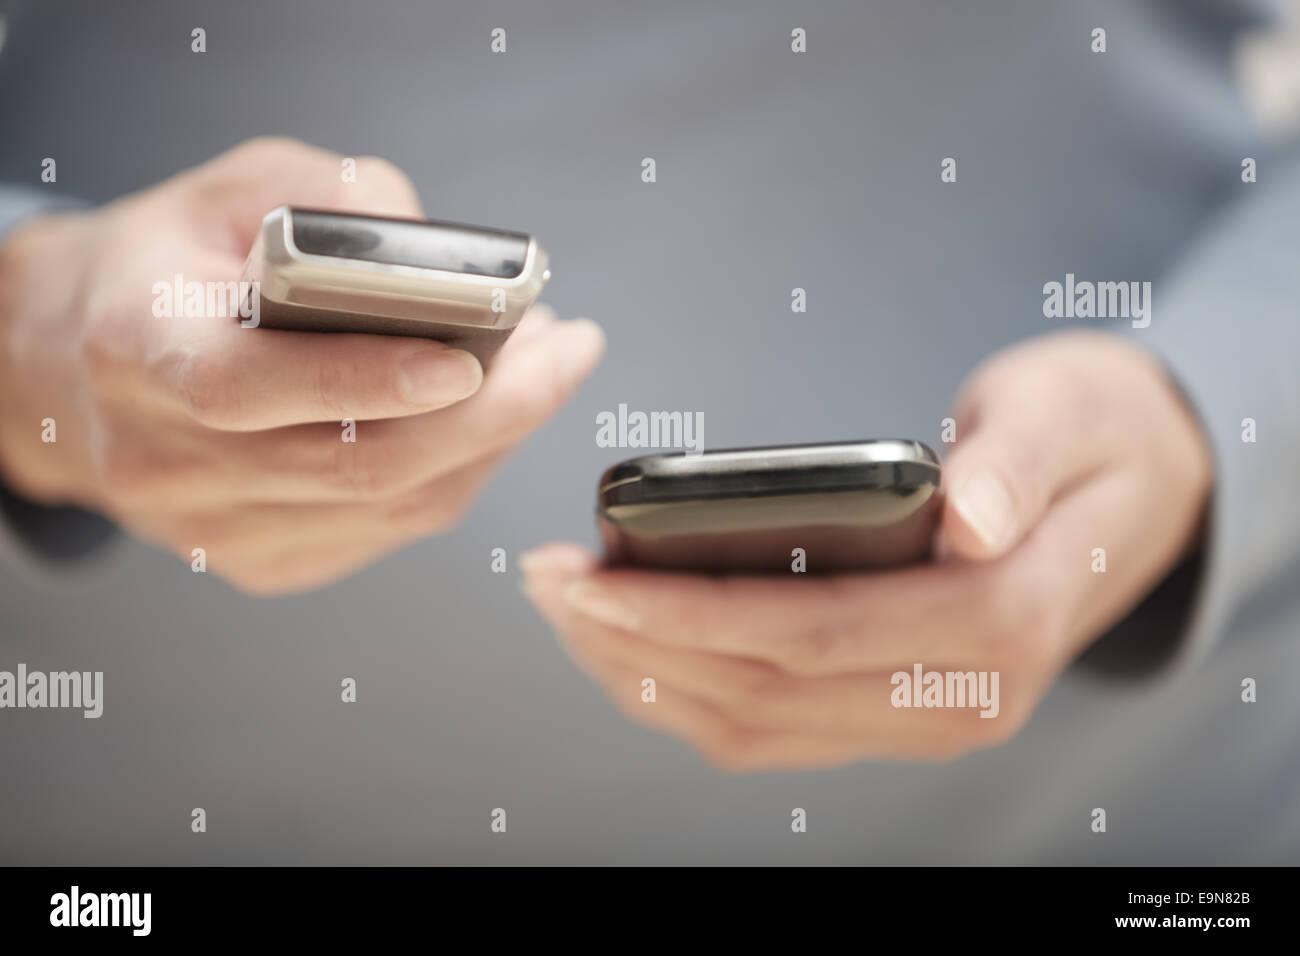 Two smartphones - Stock Image